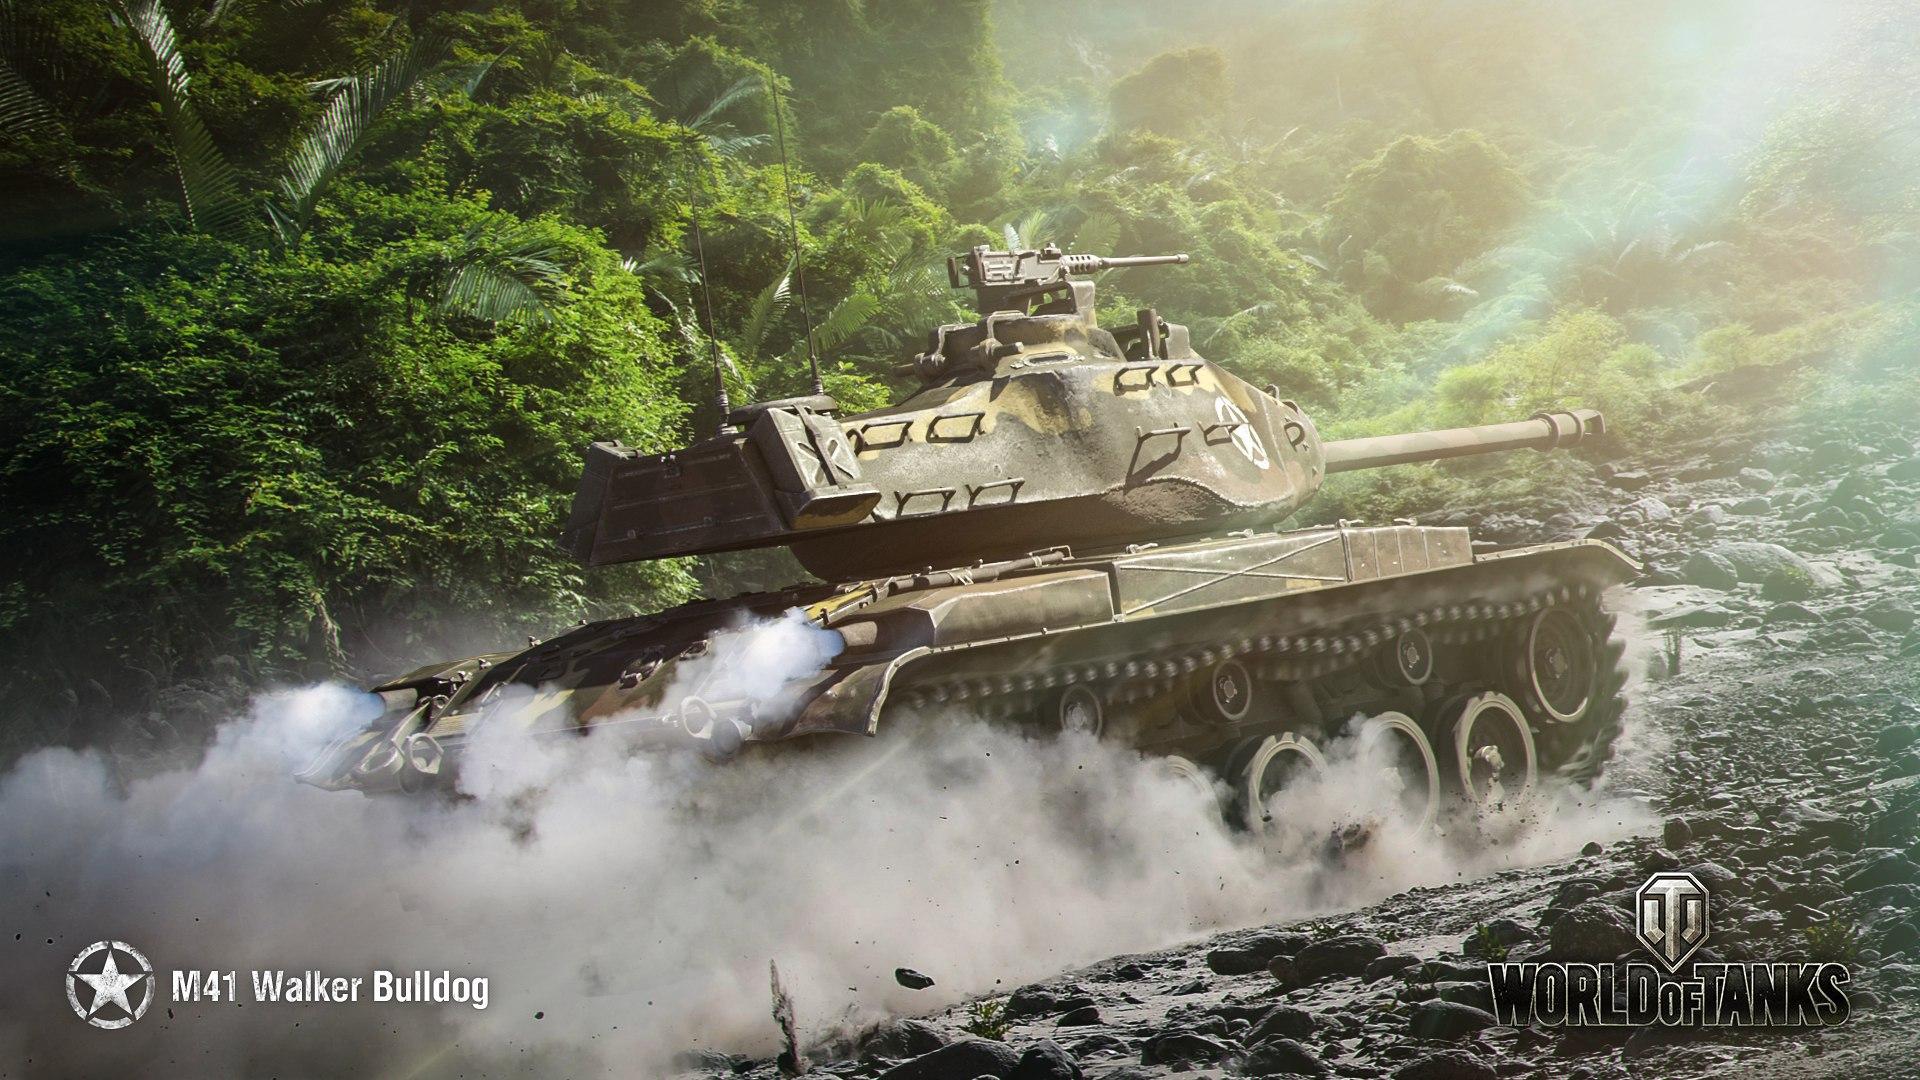 рисунок World of tanks M41 Walker Bulldog